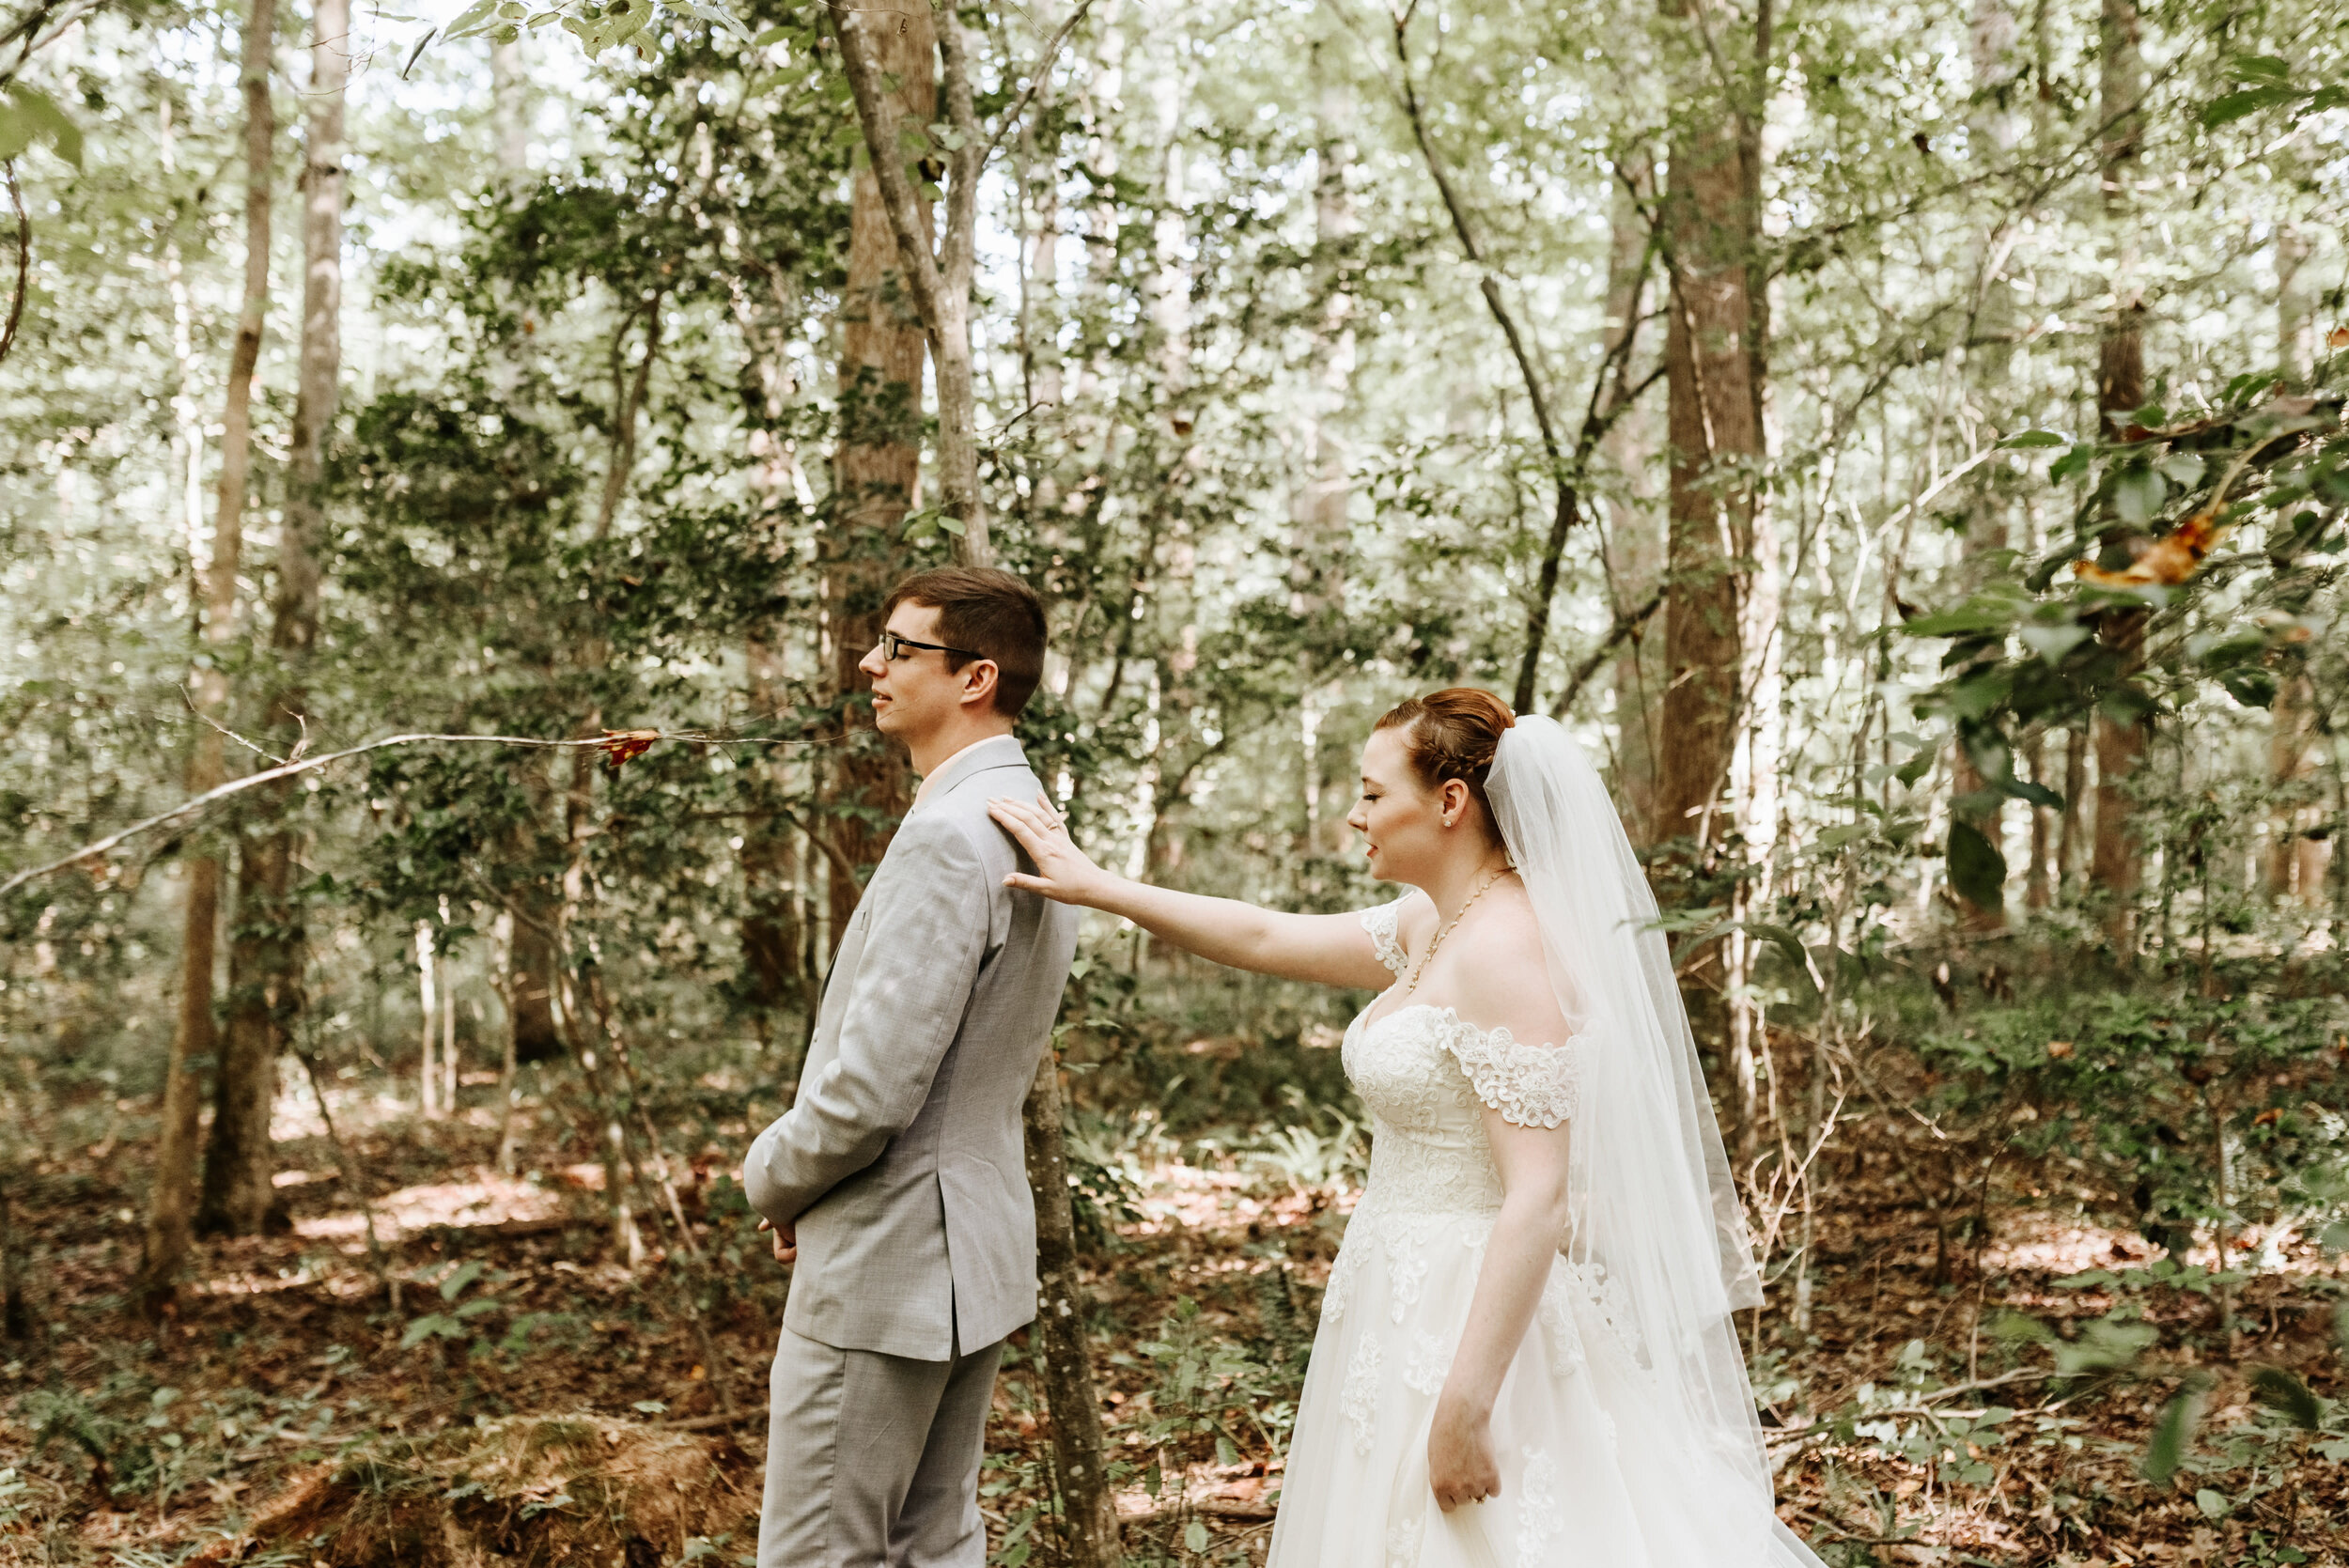 Rachel_David_Wedding_Richmond_Virginia_Photography_by_V_15.jpg